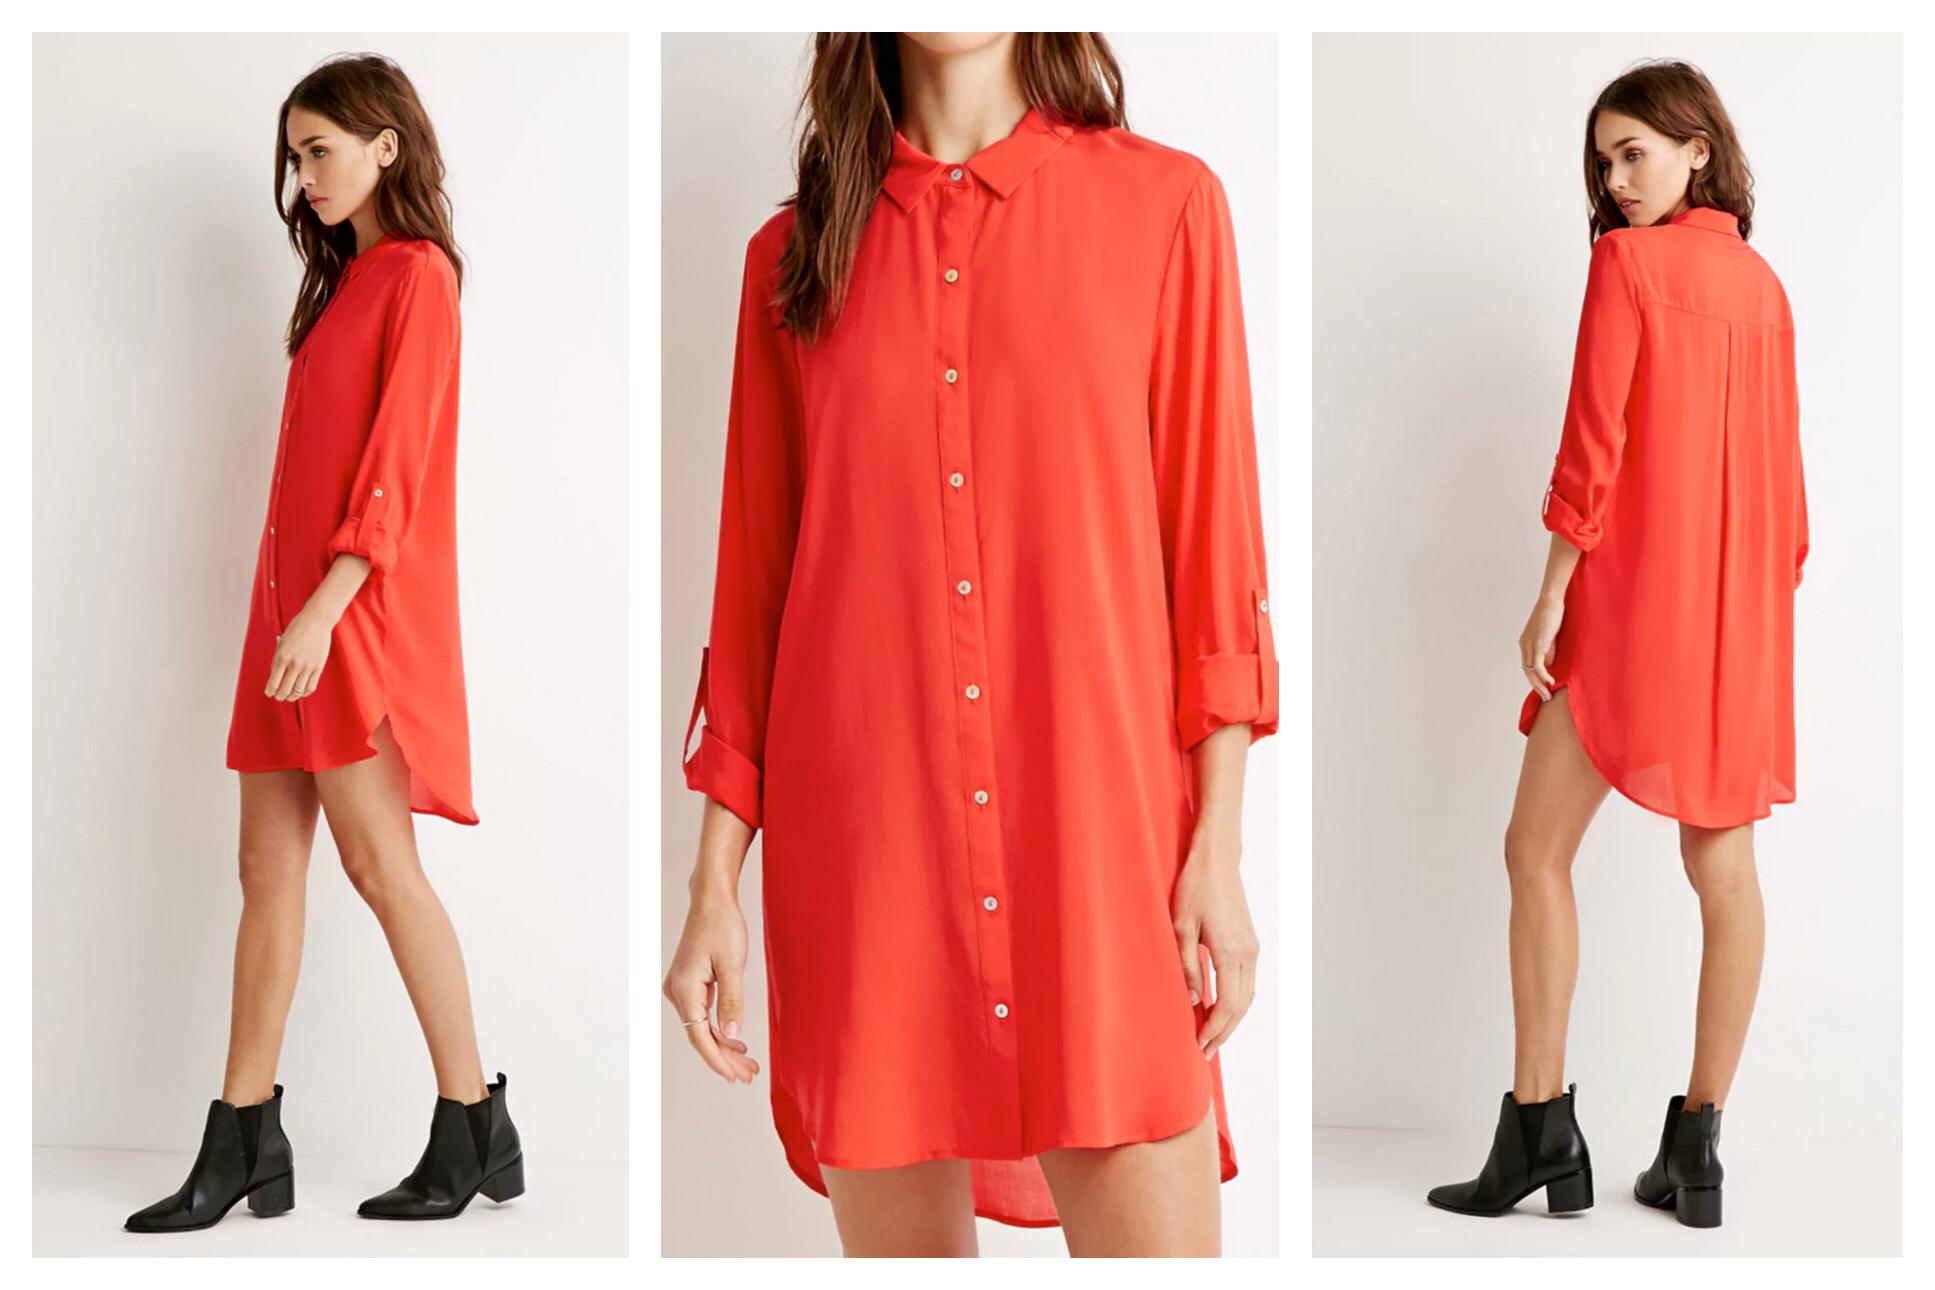 Tanger Outlets_Forever 21 Shirtdress